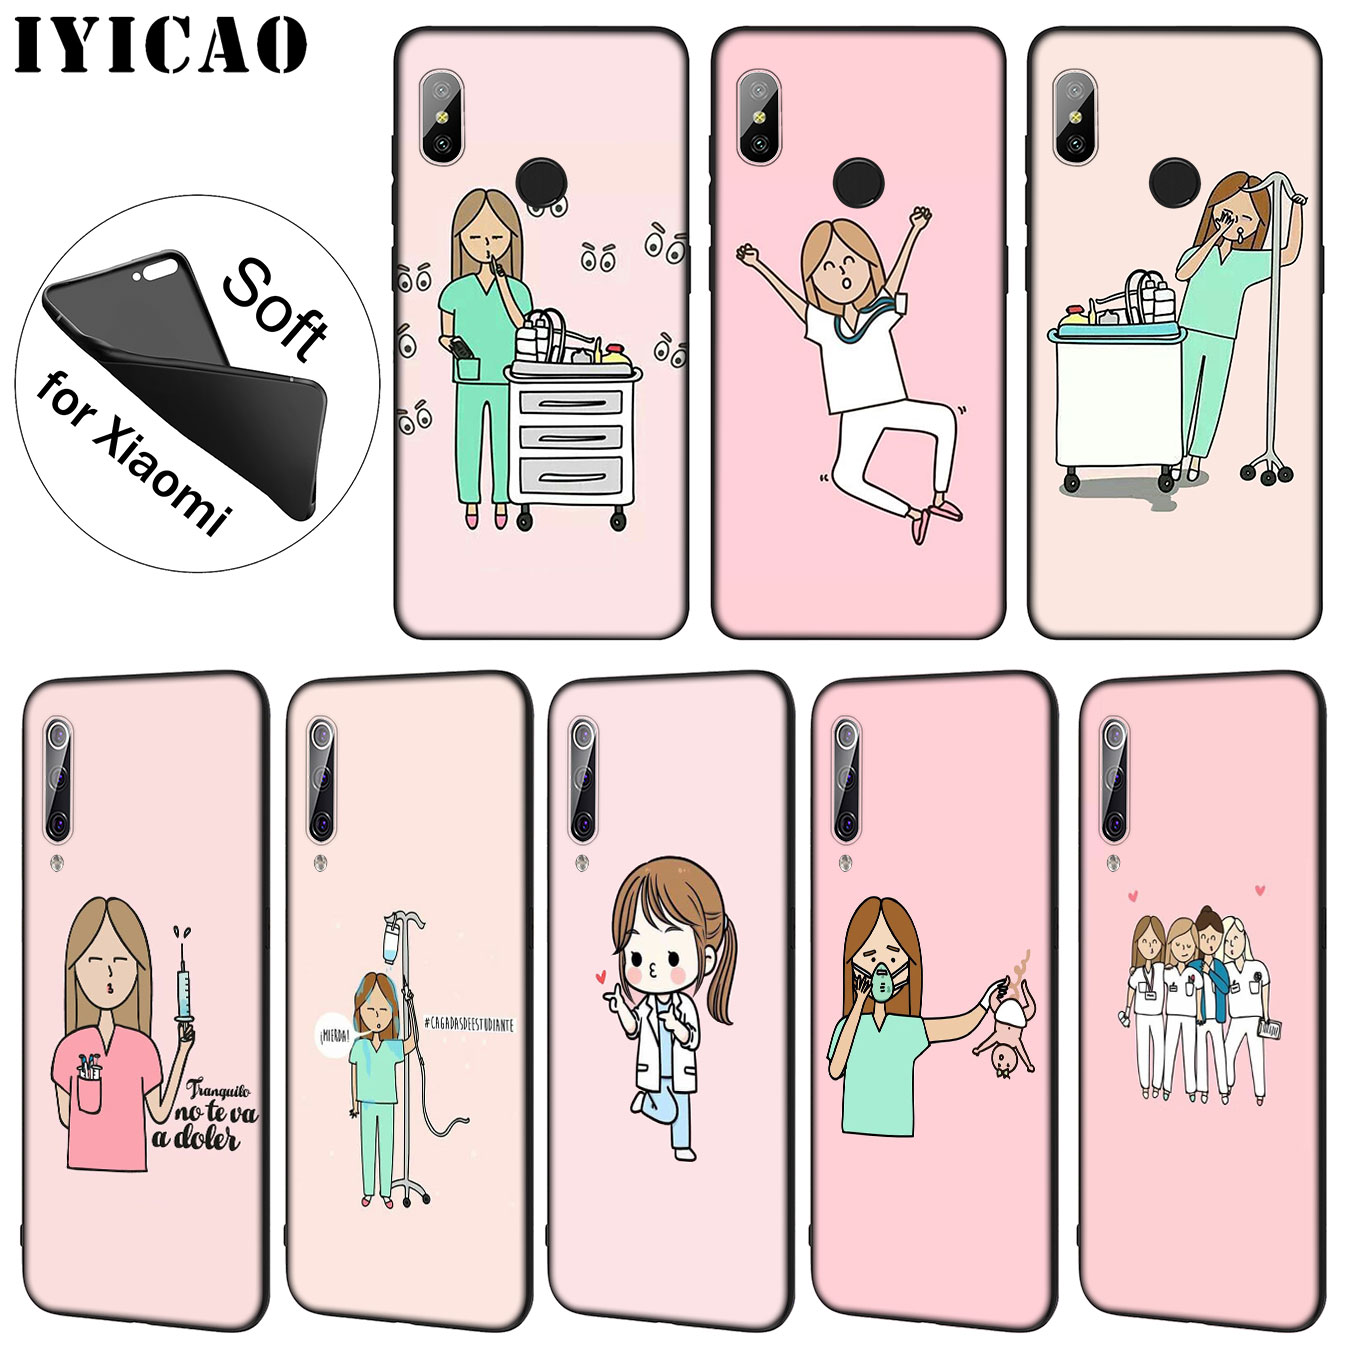 Straightforward Iyicao Cartoon Doctor Nurse Hot Fashion Fun Dynamic Soft Case For Xiaomi Mi 9 8 A2 Lite A1 6 6x Pocophone F1 Max 3 Mi9 Mi8 Mia2 Phone Bags & Cases